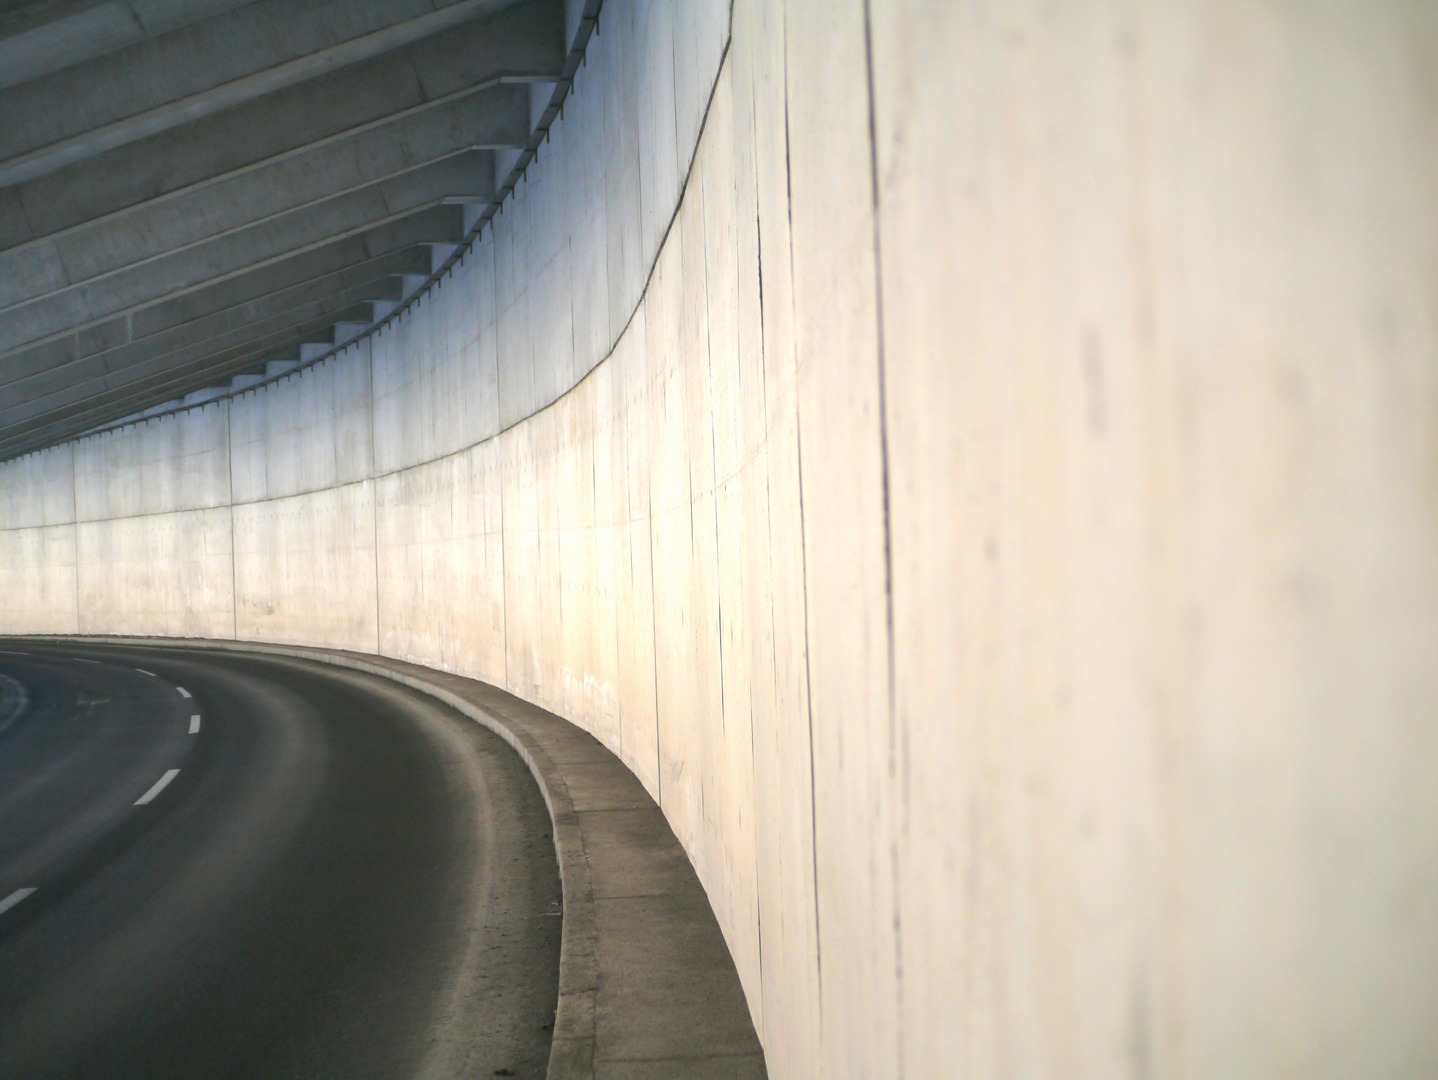 Tunnelwand